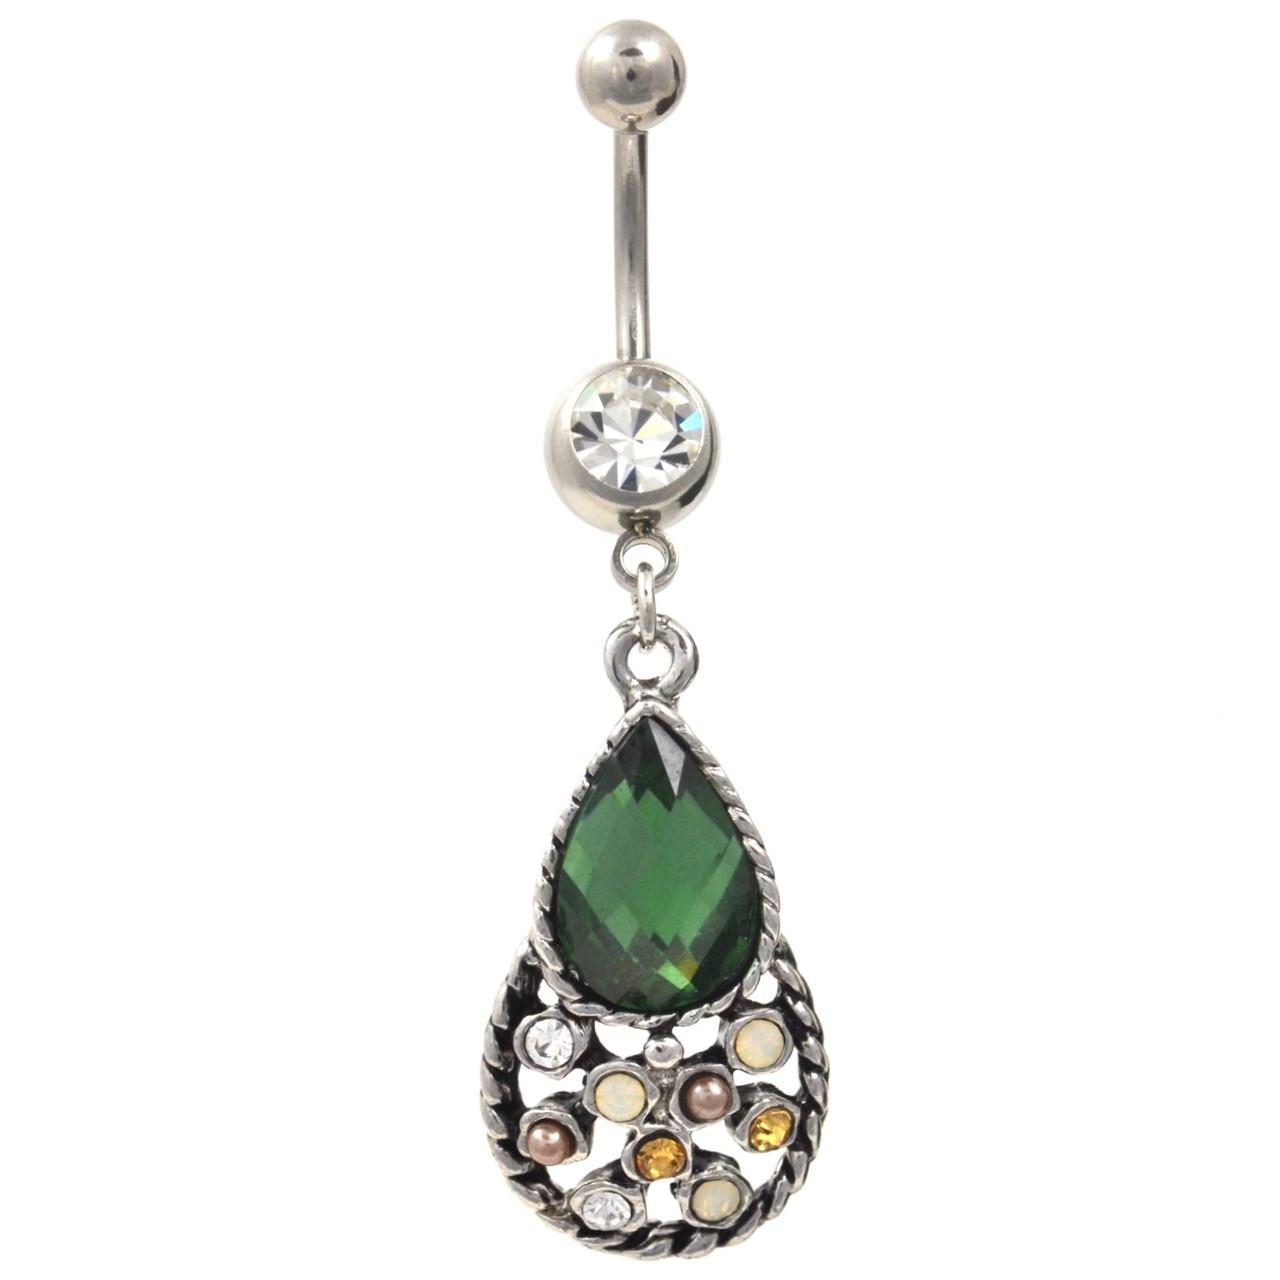 Emerald Green Tear Drop Pendant Belly Ring